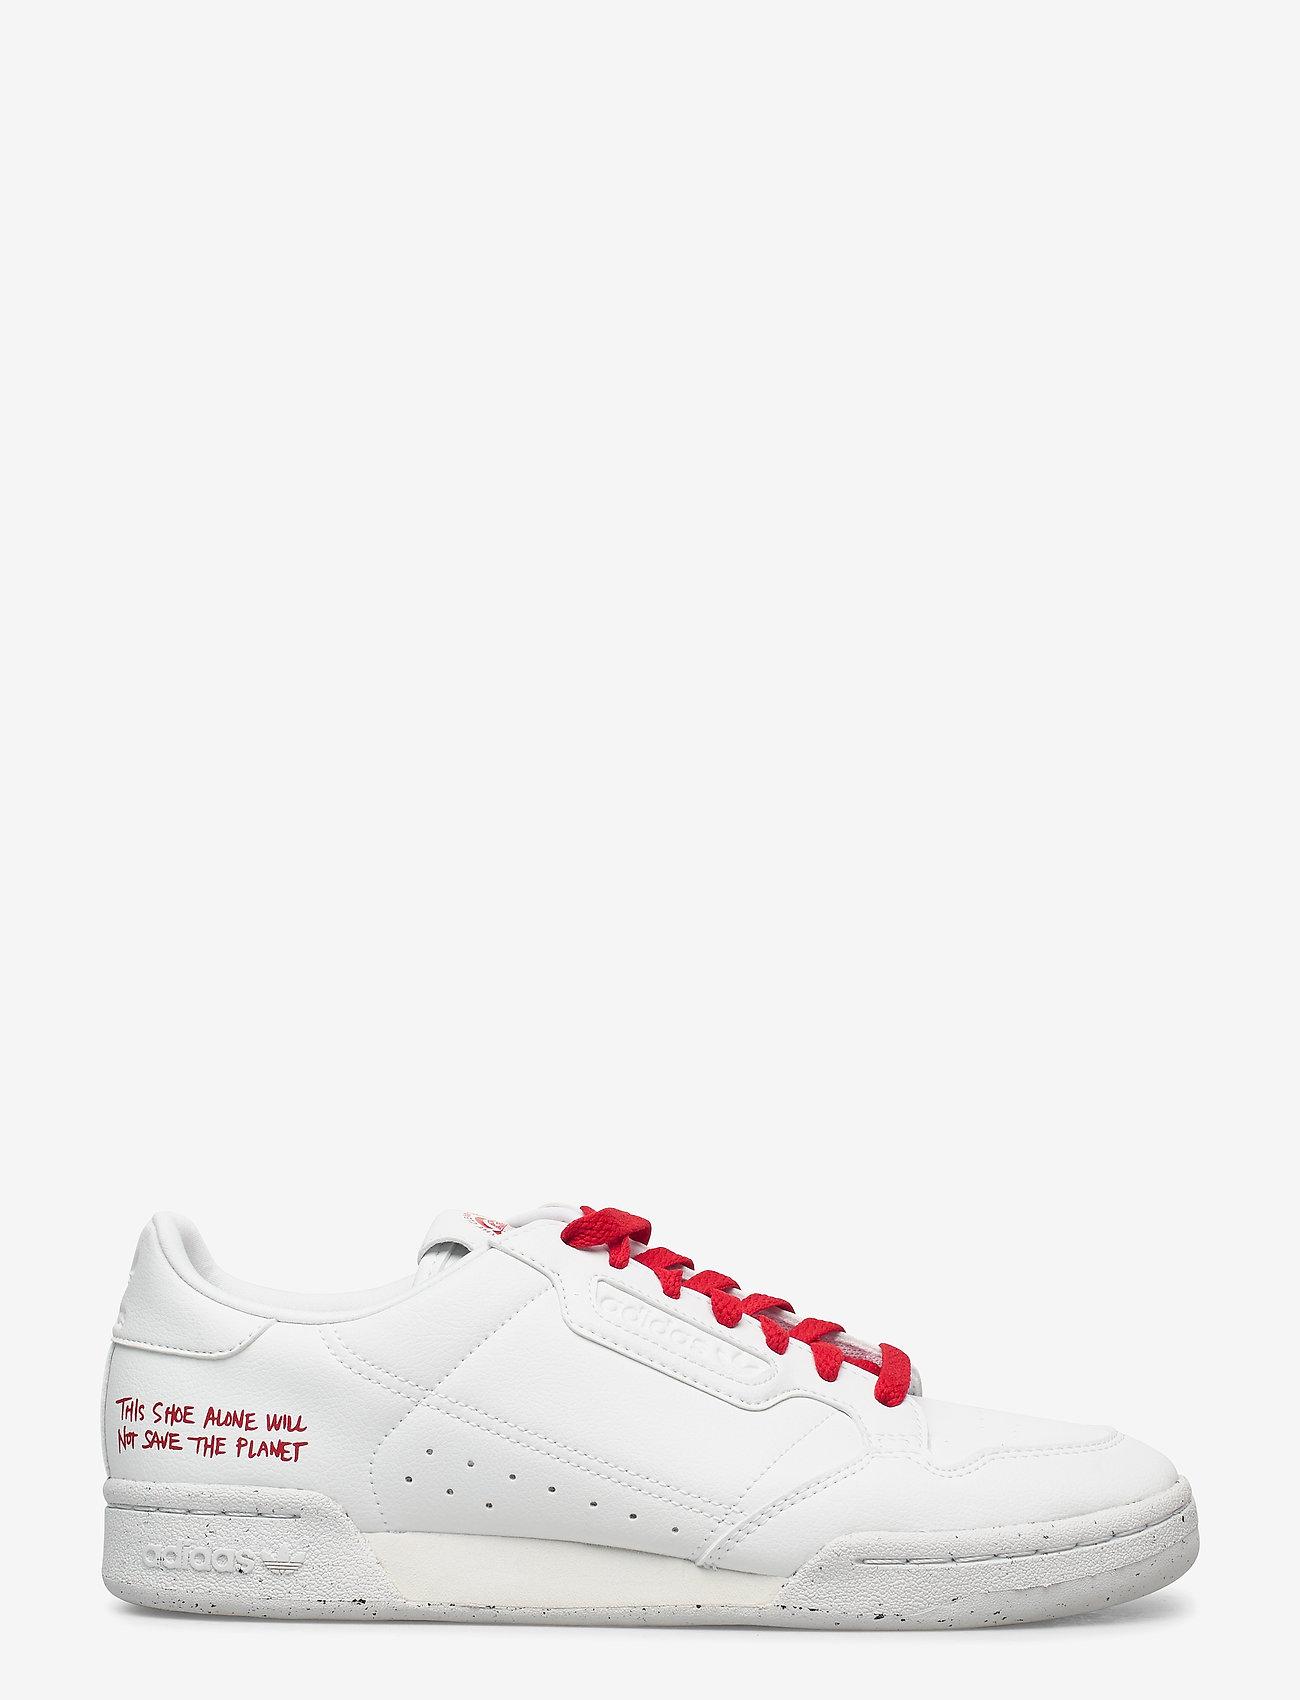 Continental 80 (Ftwwht/ftwwht/scarle) (71.47 €) - adidas Originals JMuvF